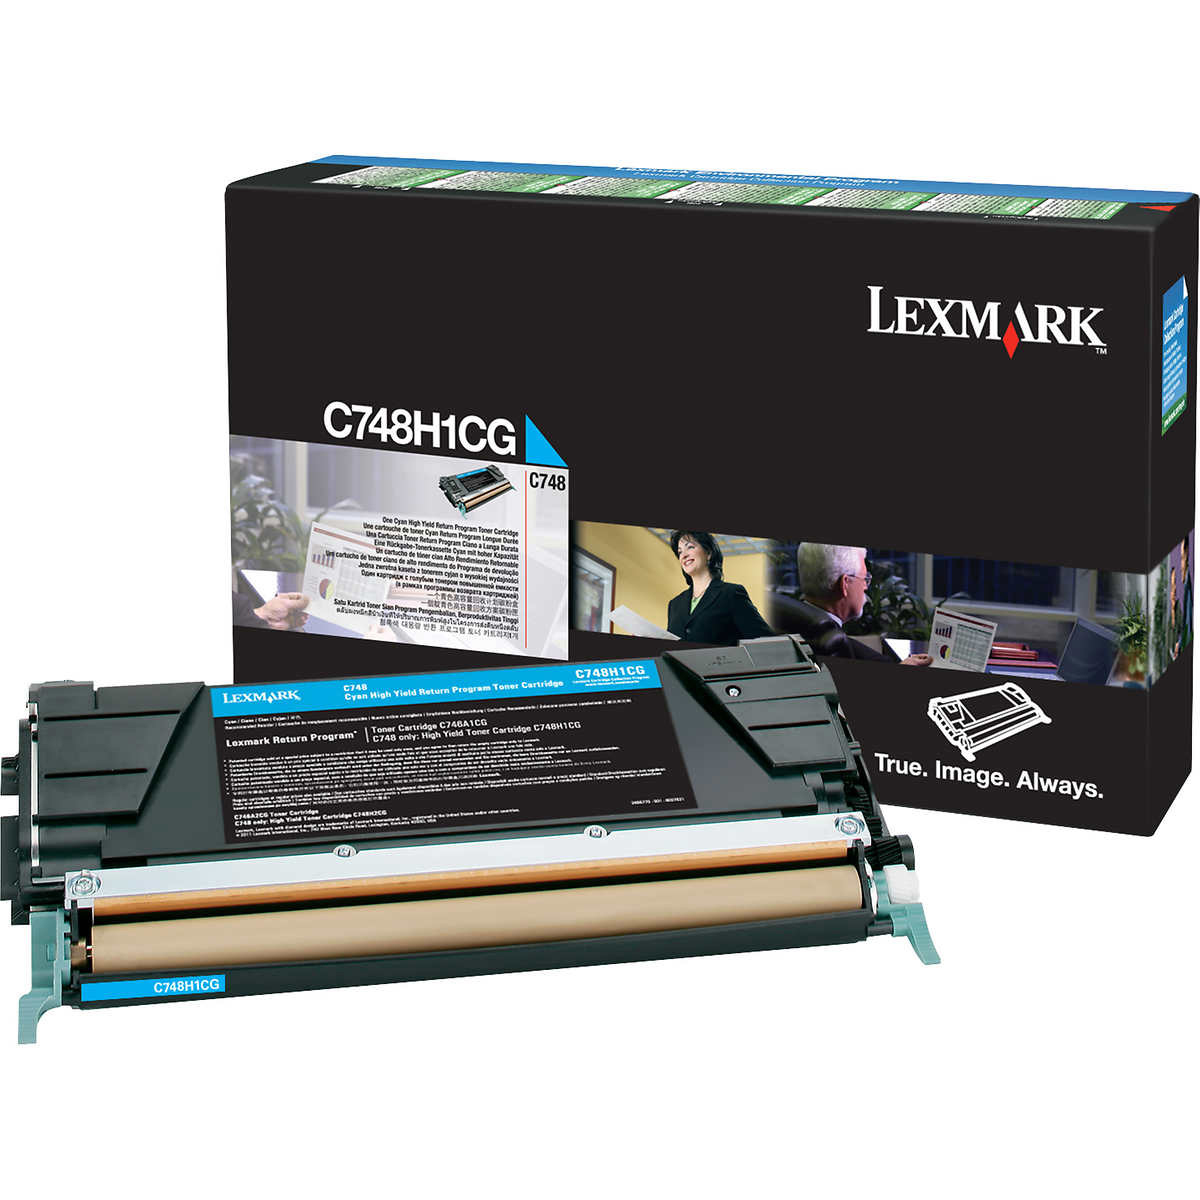 Original Lexmark C748H1CG Cyan High Capacity Toner Cartridge (C748H3CG)